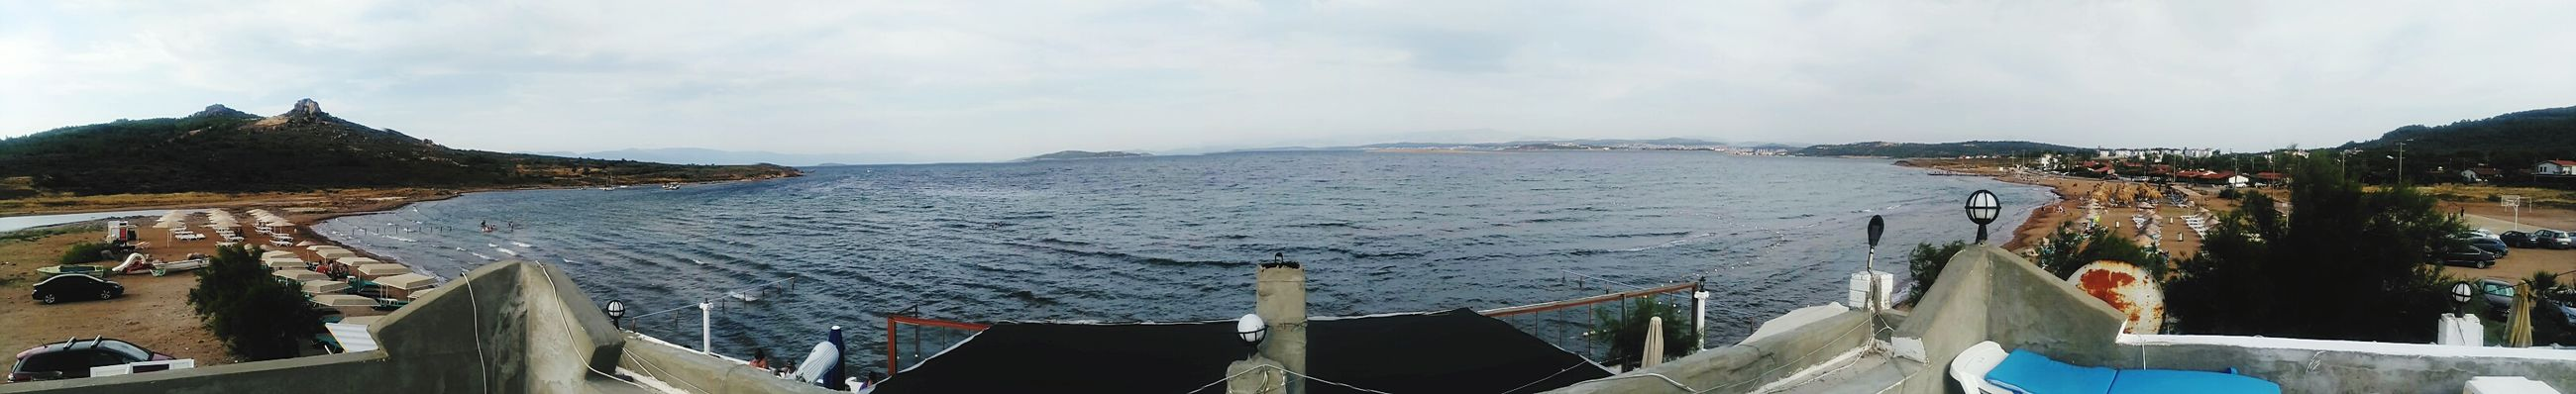 Accidents And Disasters Water Panoramic Sea Landscape Beach No People Outdoors Flood Day Sky Ayvalik 🐚🐳🐬🏊 Cunda Adası çataltepe Balıkesir Türkiye